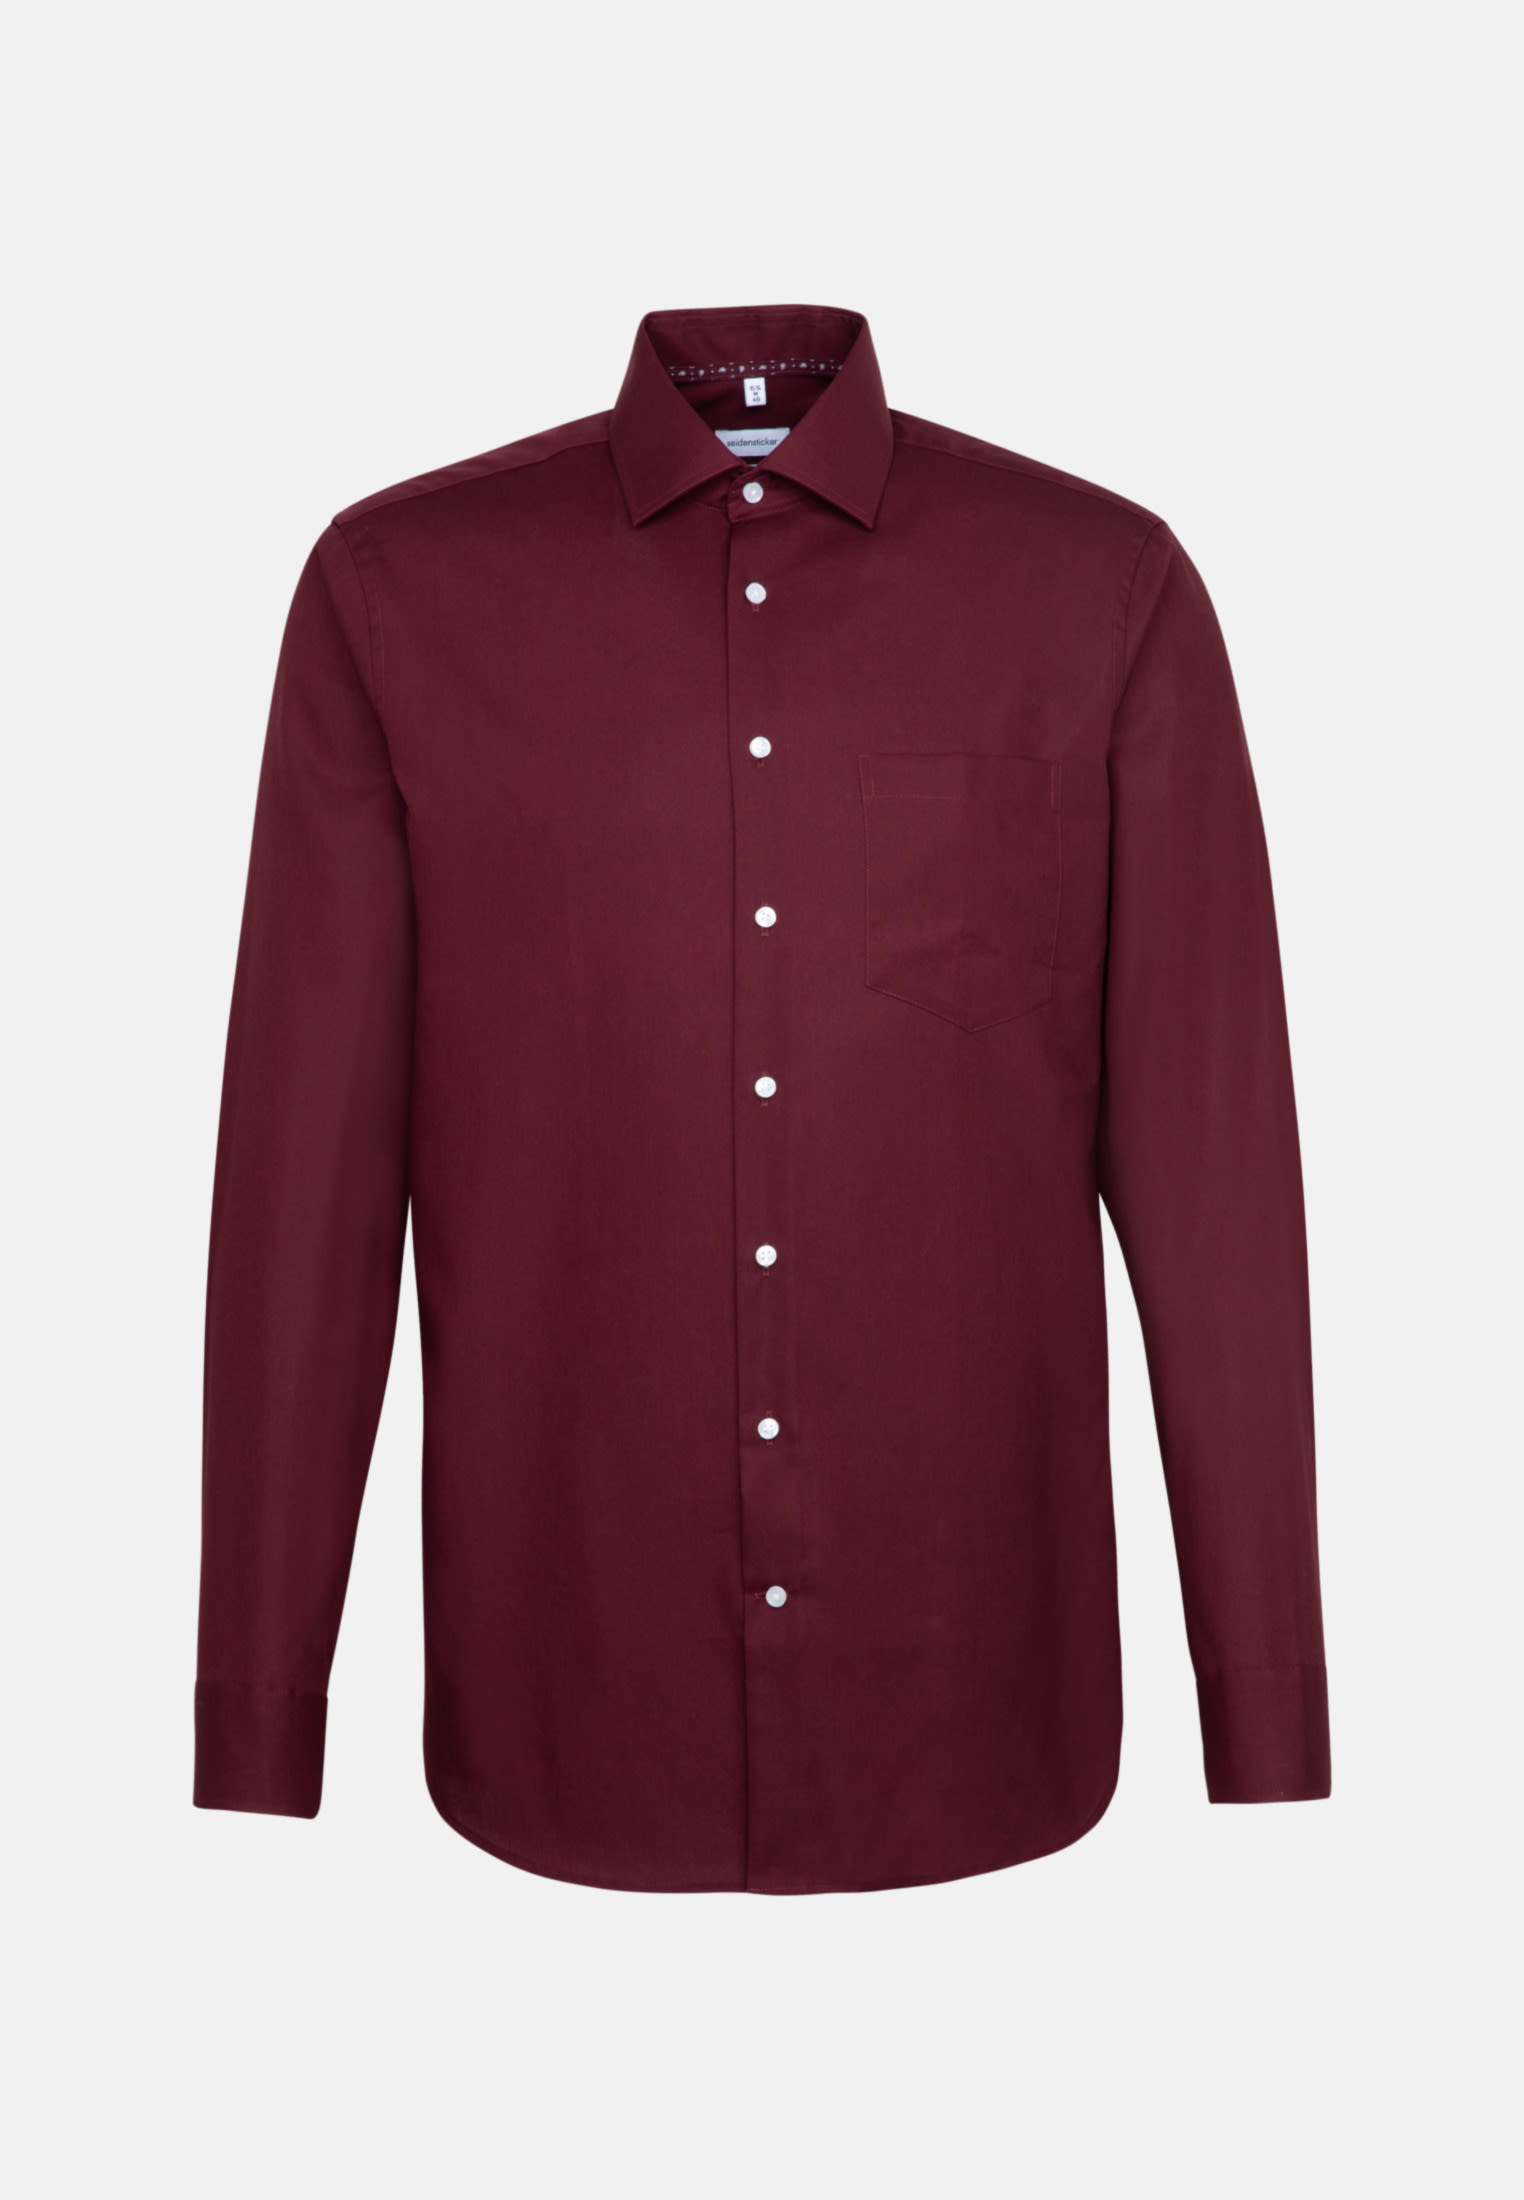 Bügelfreies Popeline Business Hemd in Comfort mit Kentkragen in Rot |  Seidensticker Onlineshop